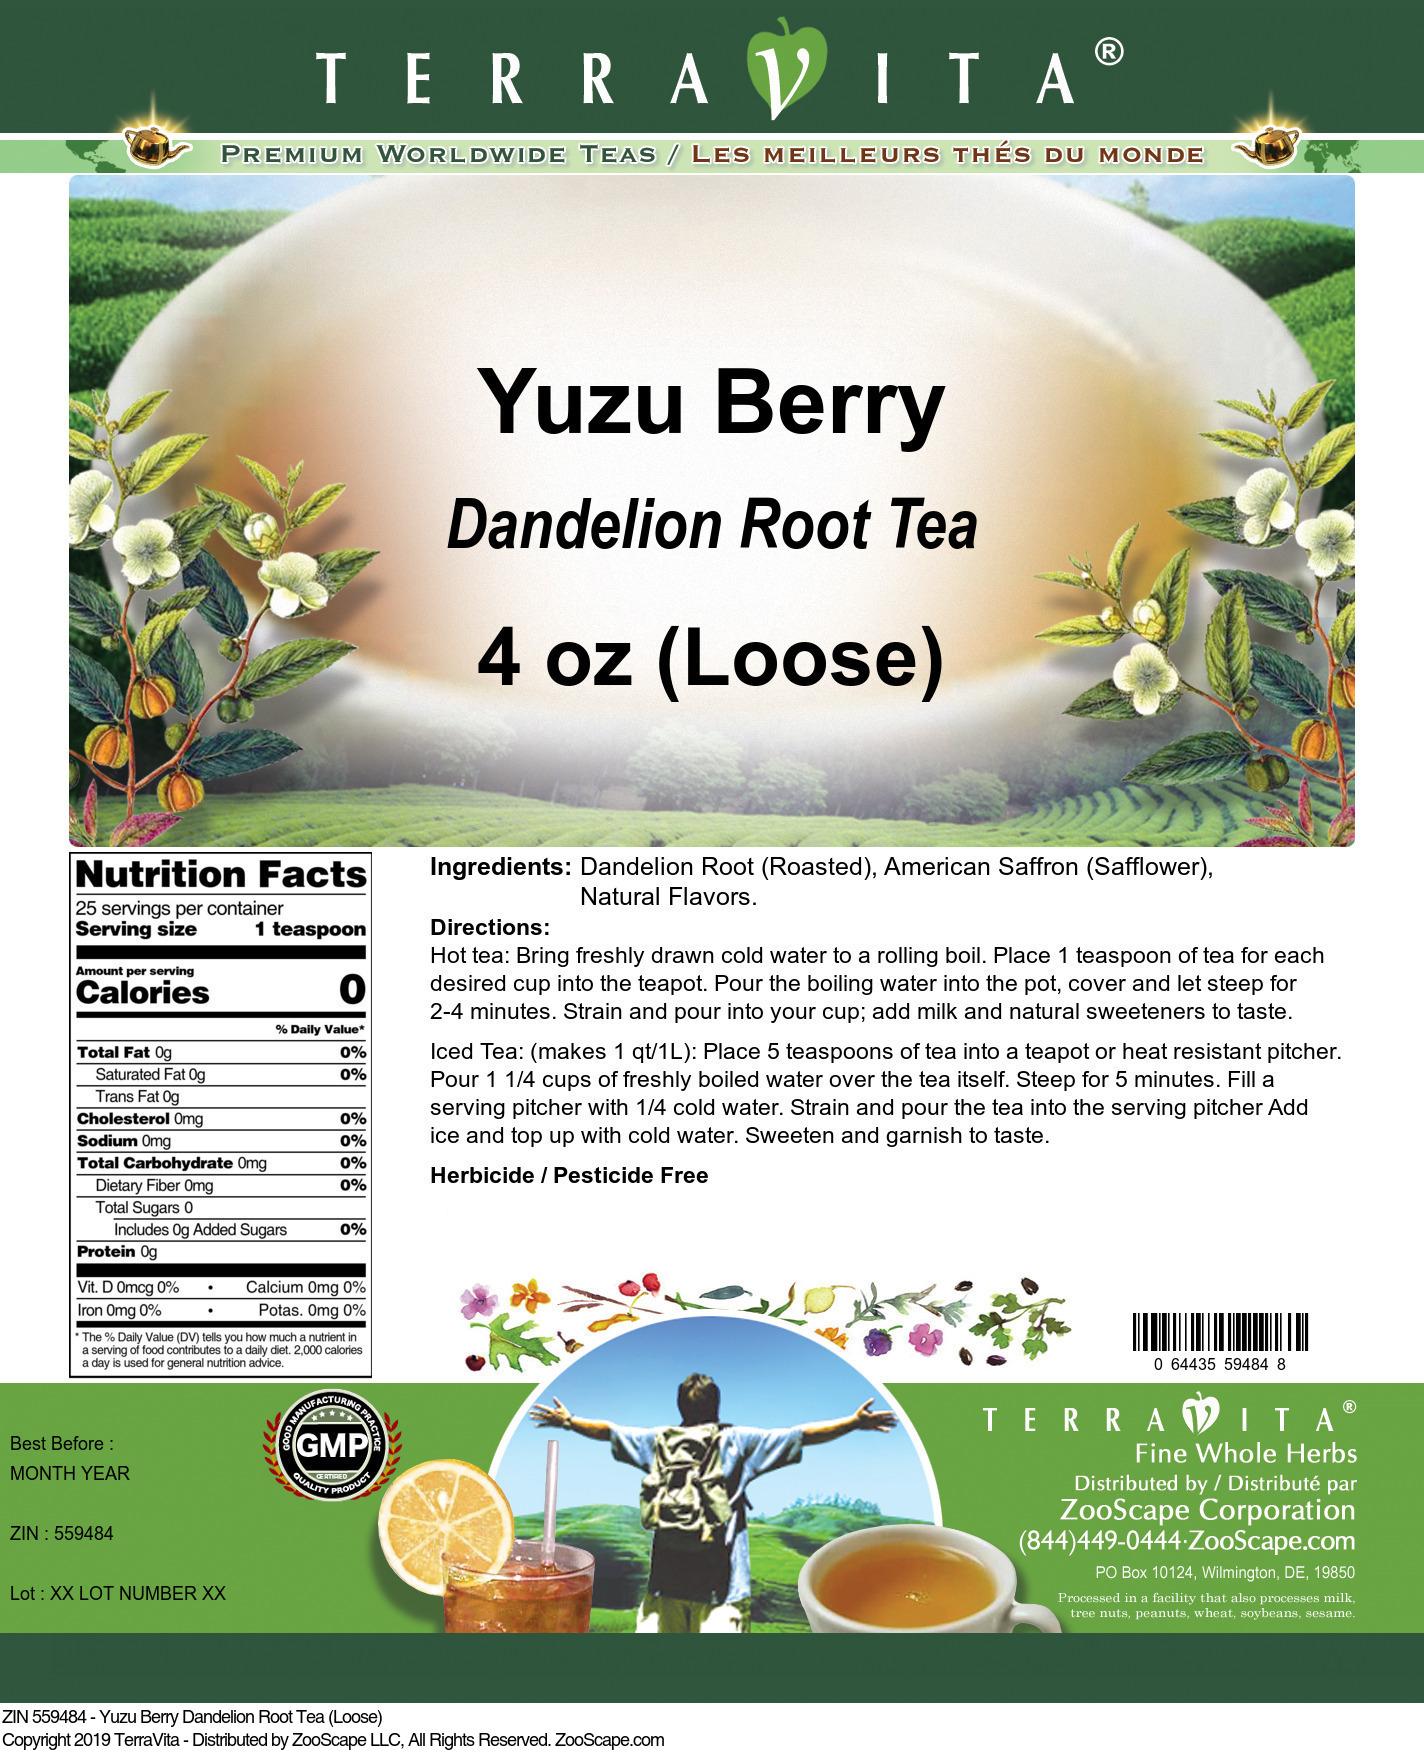 Yuzu Berry Dandelion Root